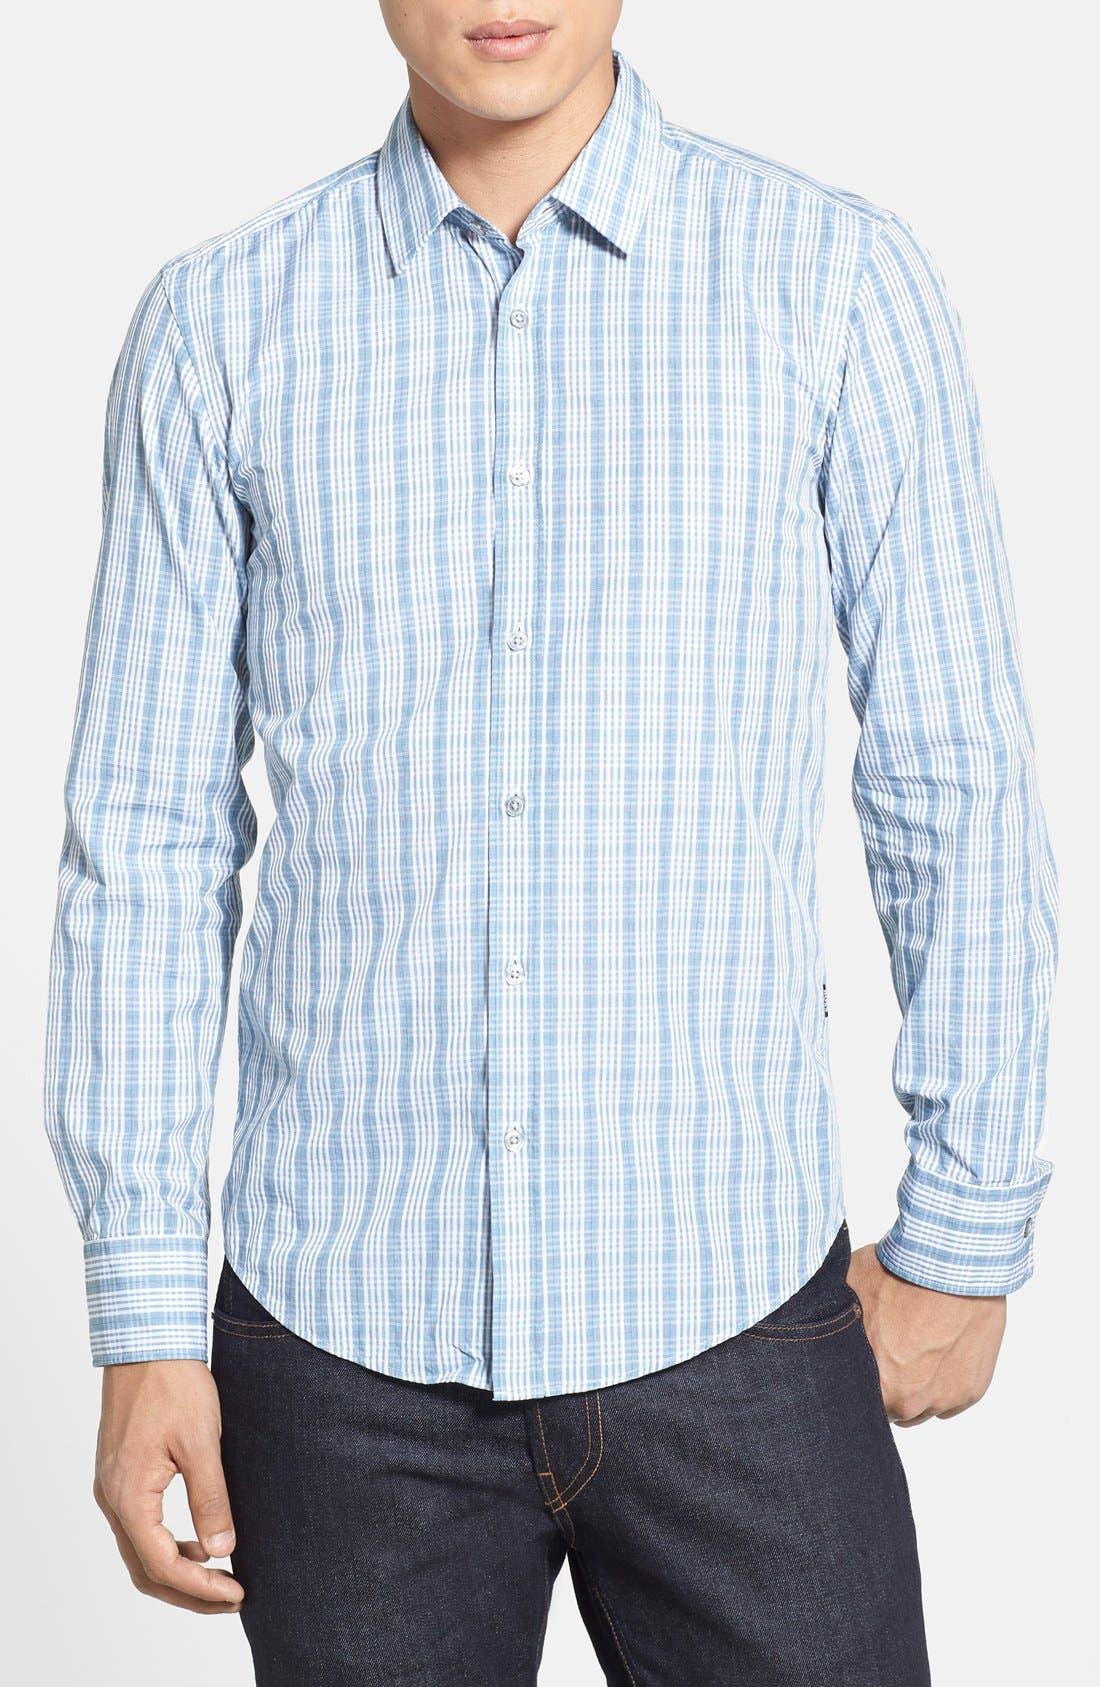 Alternate Image 1 Selected - BOSS HUGO BOSS 'Ronny' Slim Fit Plaid Sport Shirt